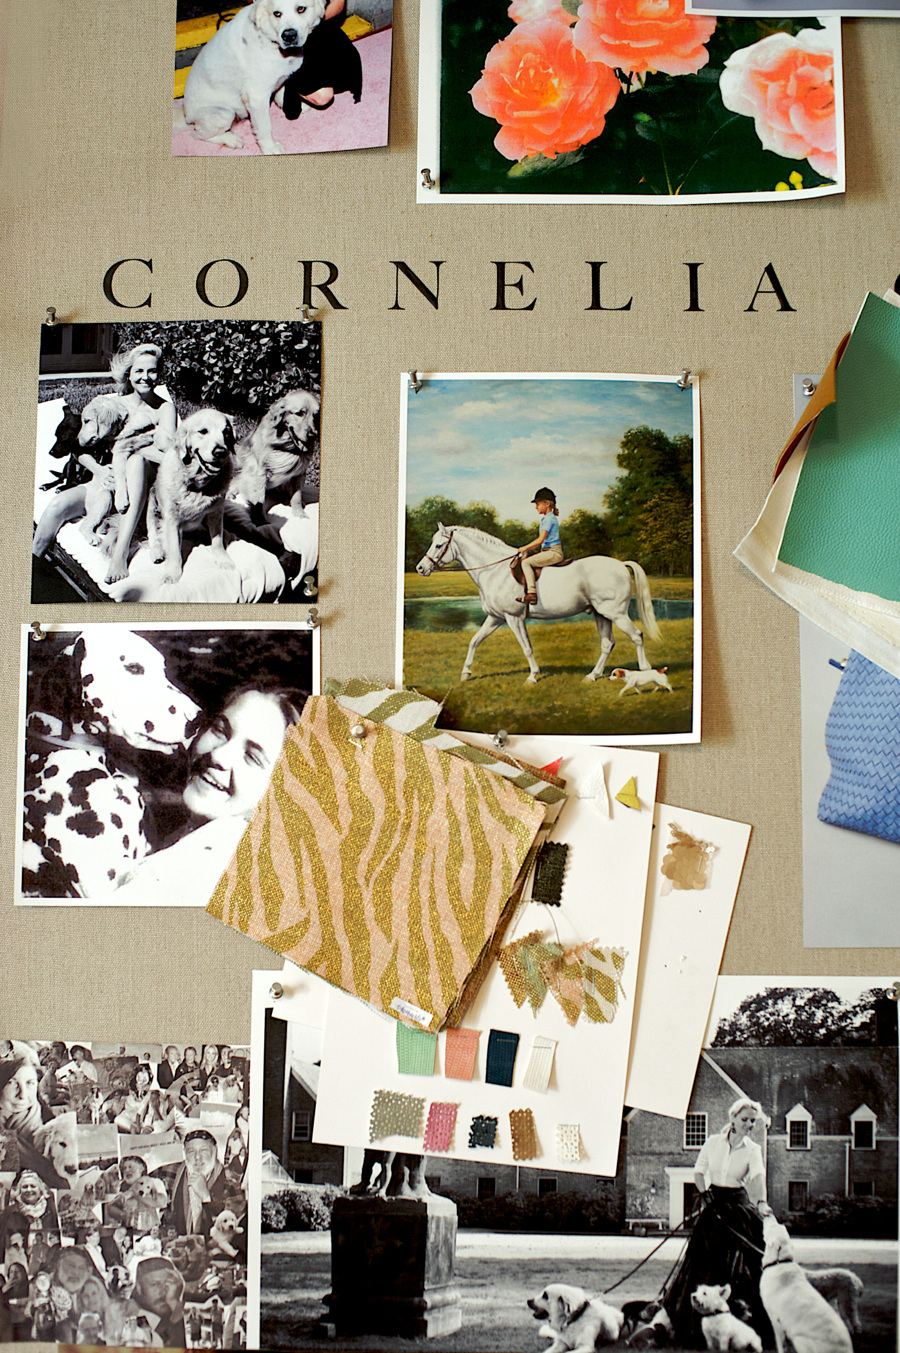 Cornelia-guest-matchbook-magazine-10